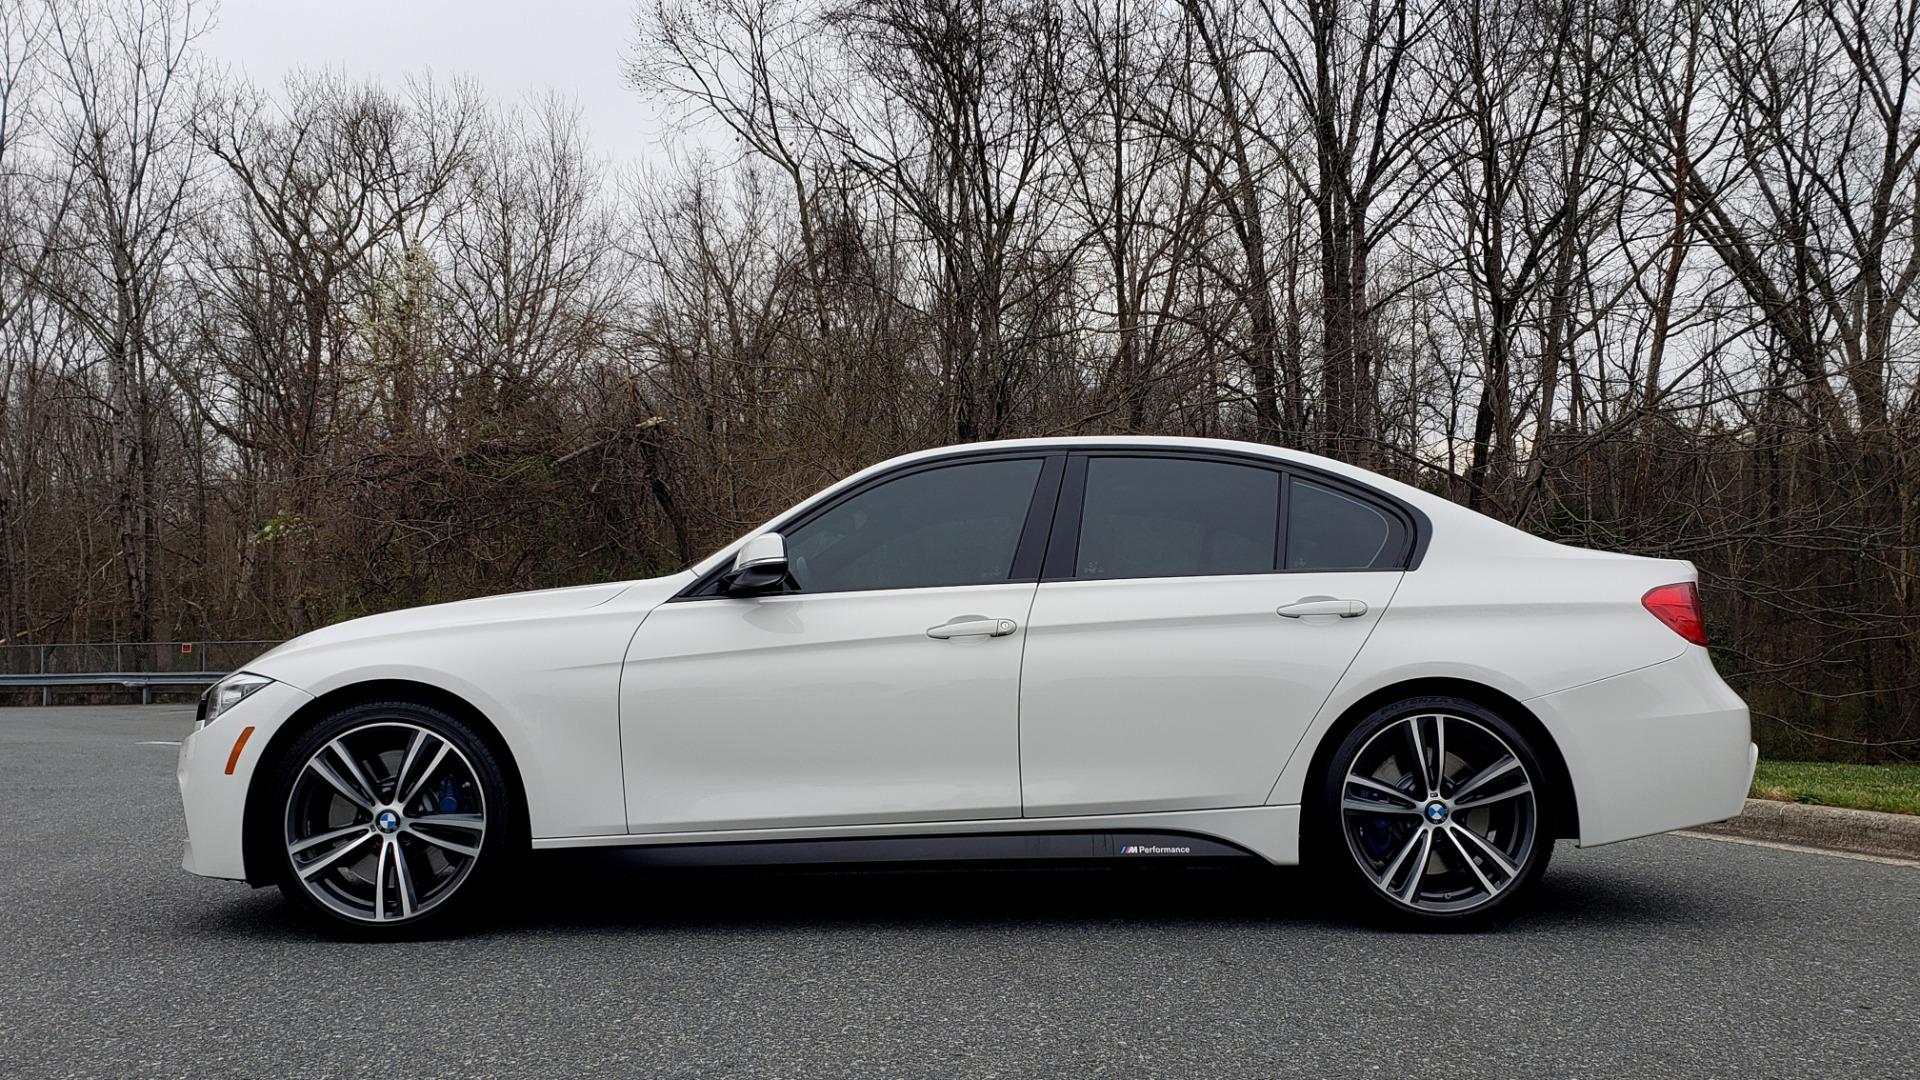 Used 2015 BMW 3 Series 335I M-SPORT / PREM PKG / HK SND / SUNROOF / REARVIEW for sale Sold at Formula Imports in Charlotte NC 28227 2